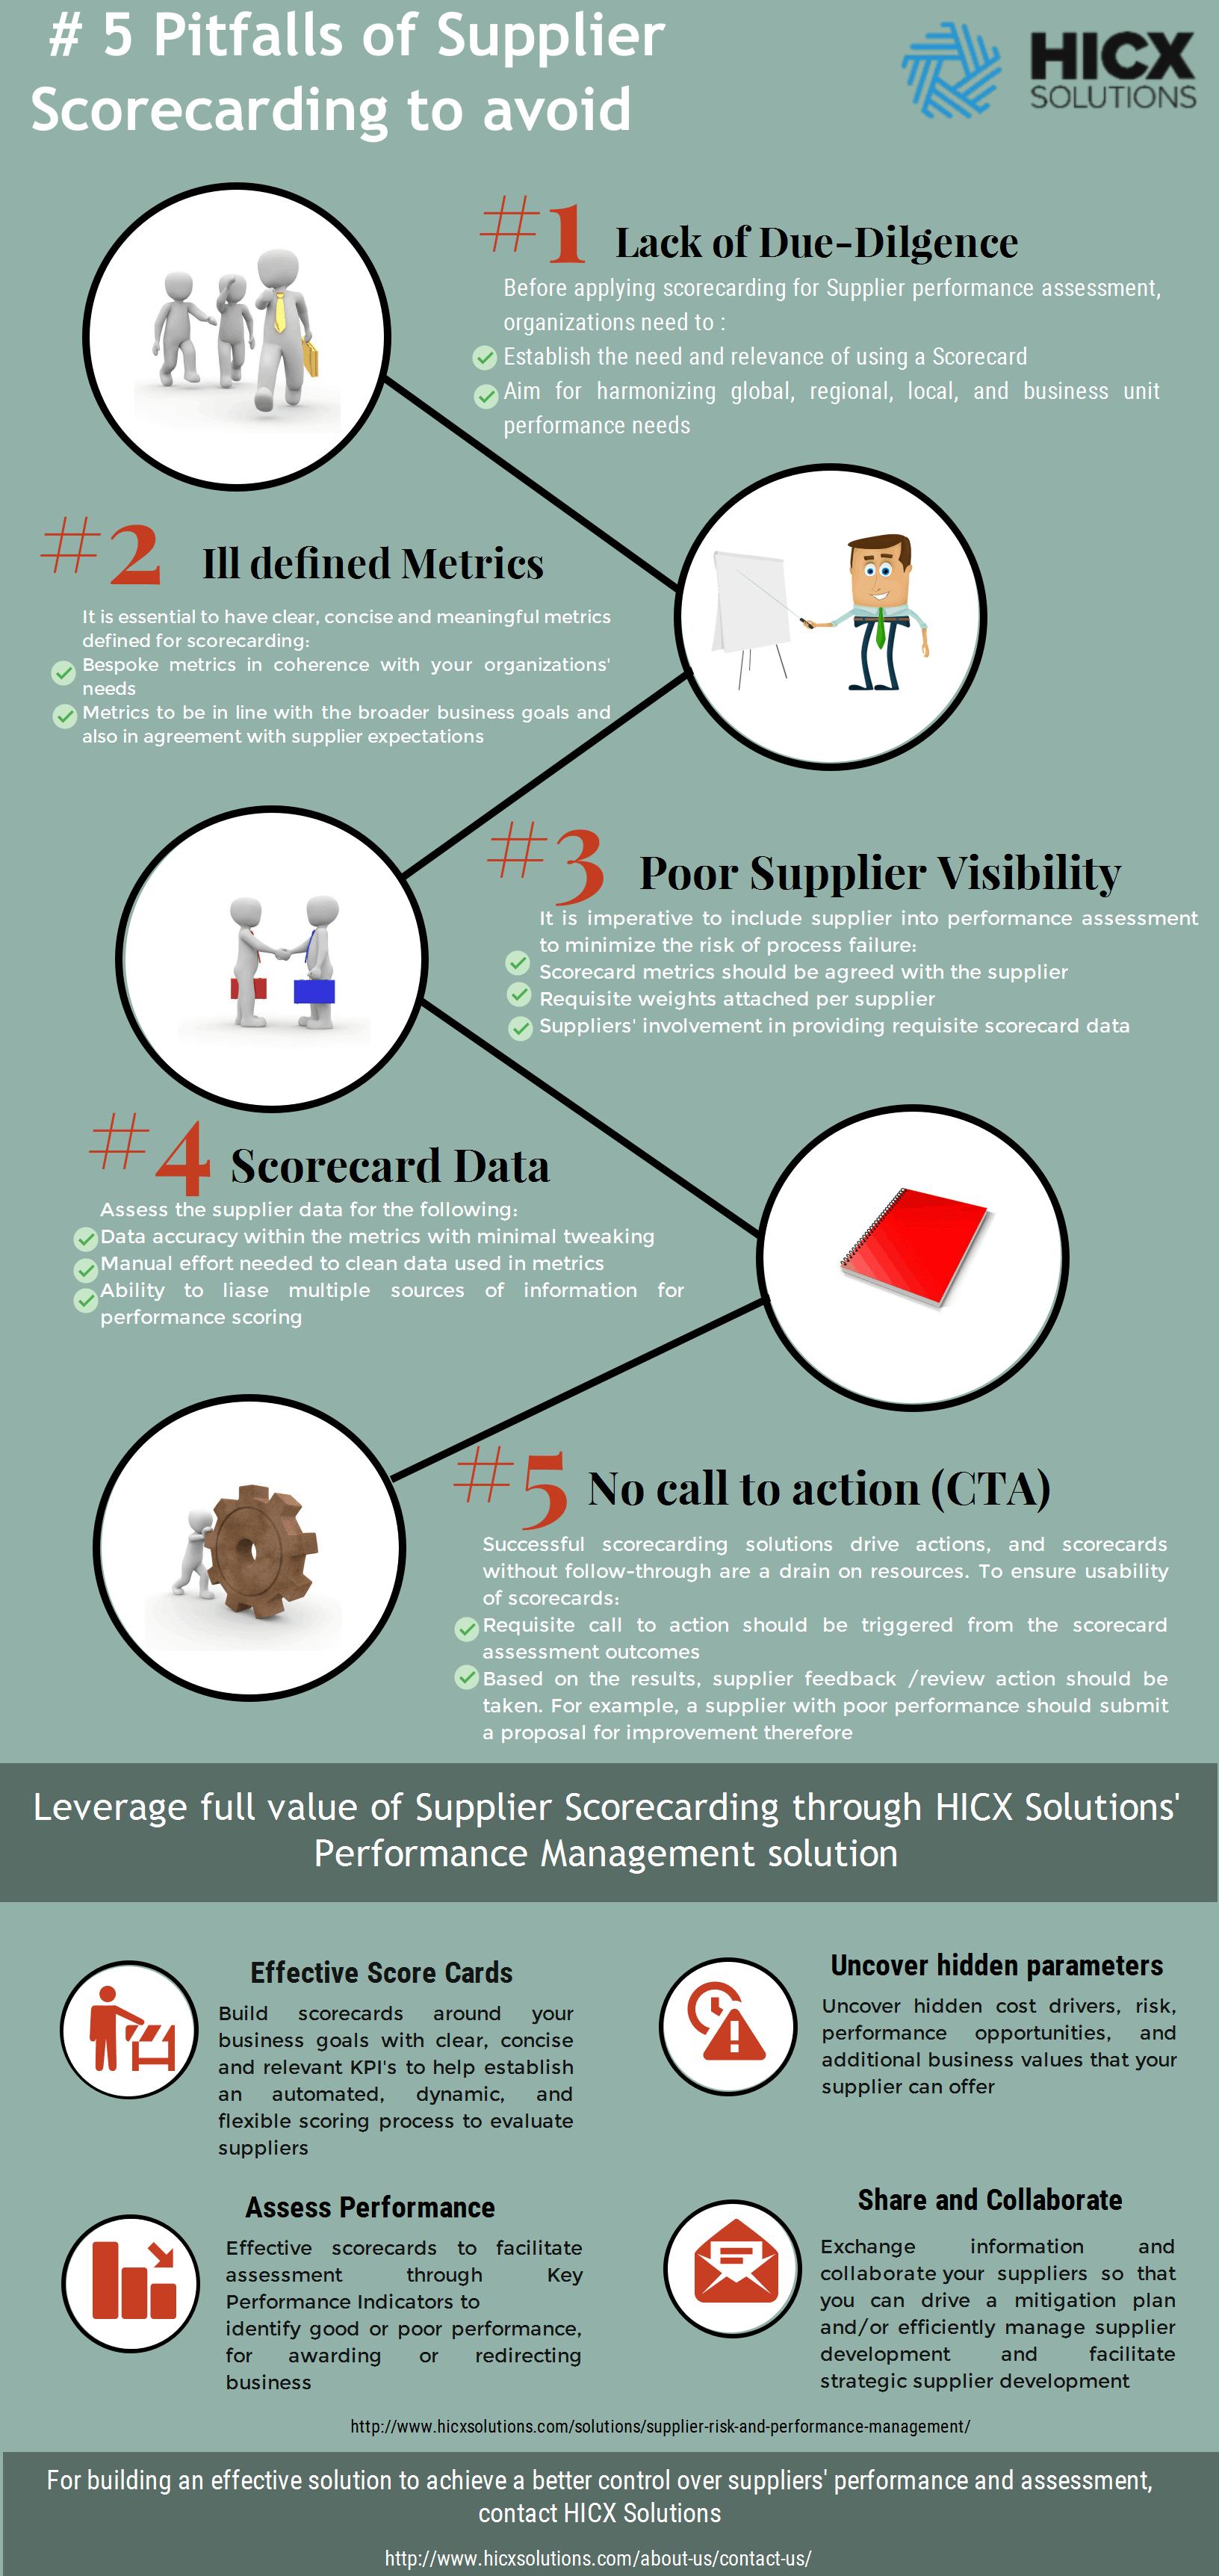 Scorecarding - 5 Pitfalls of Supplier Scorecarding